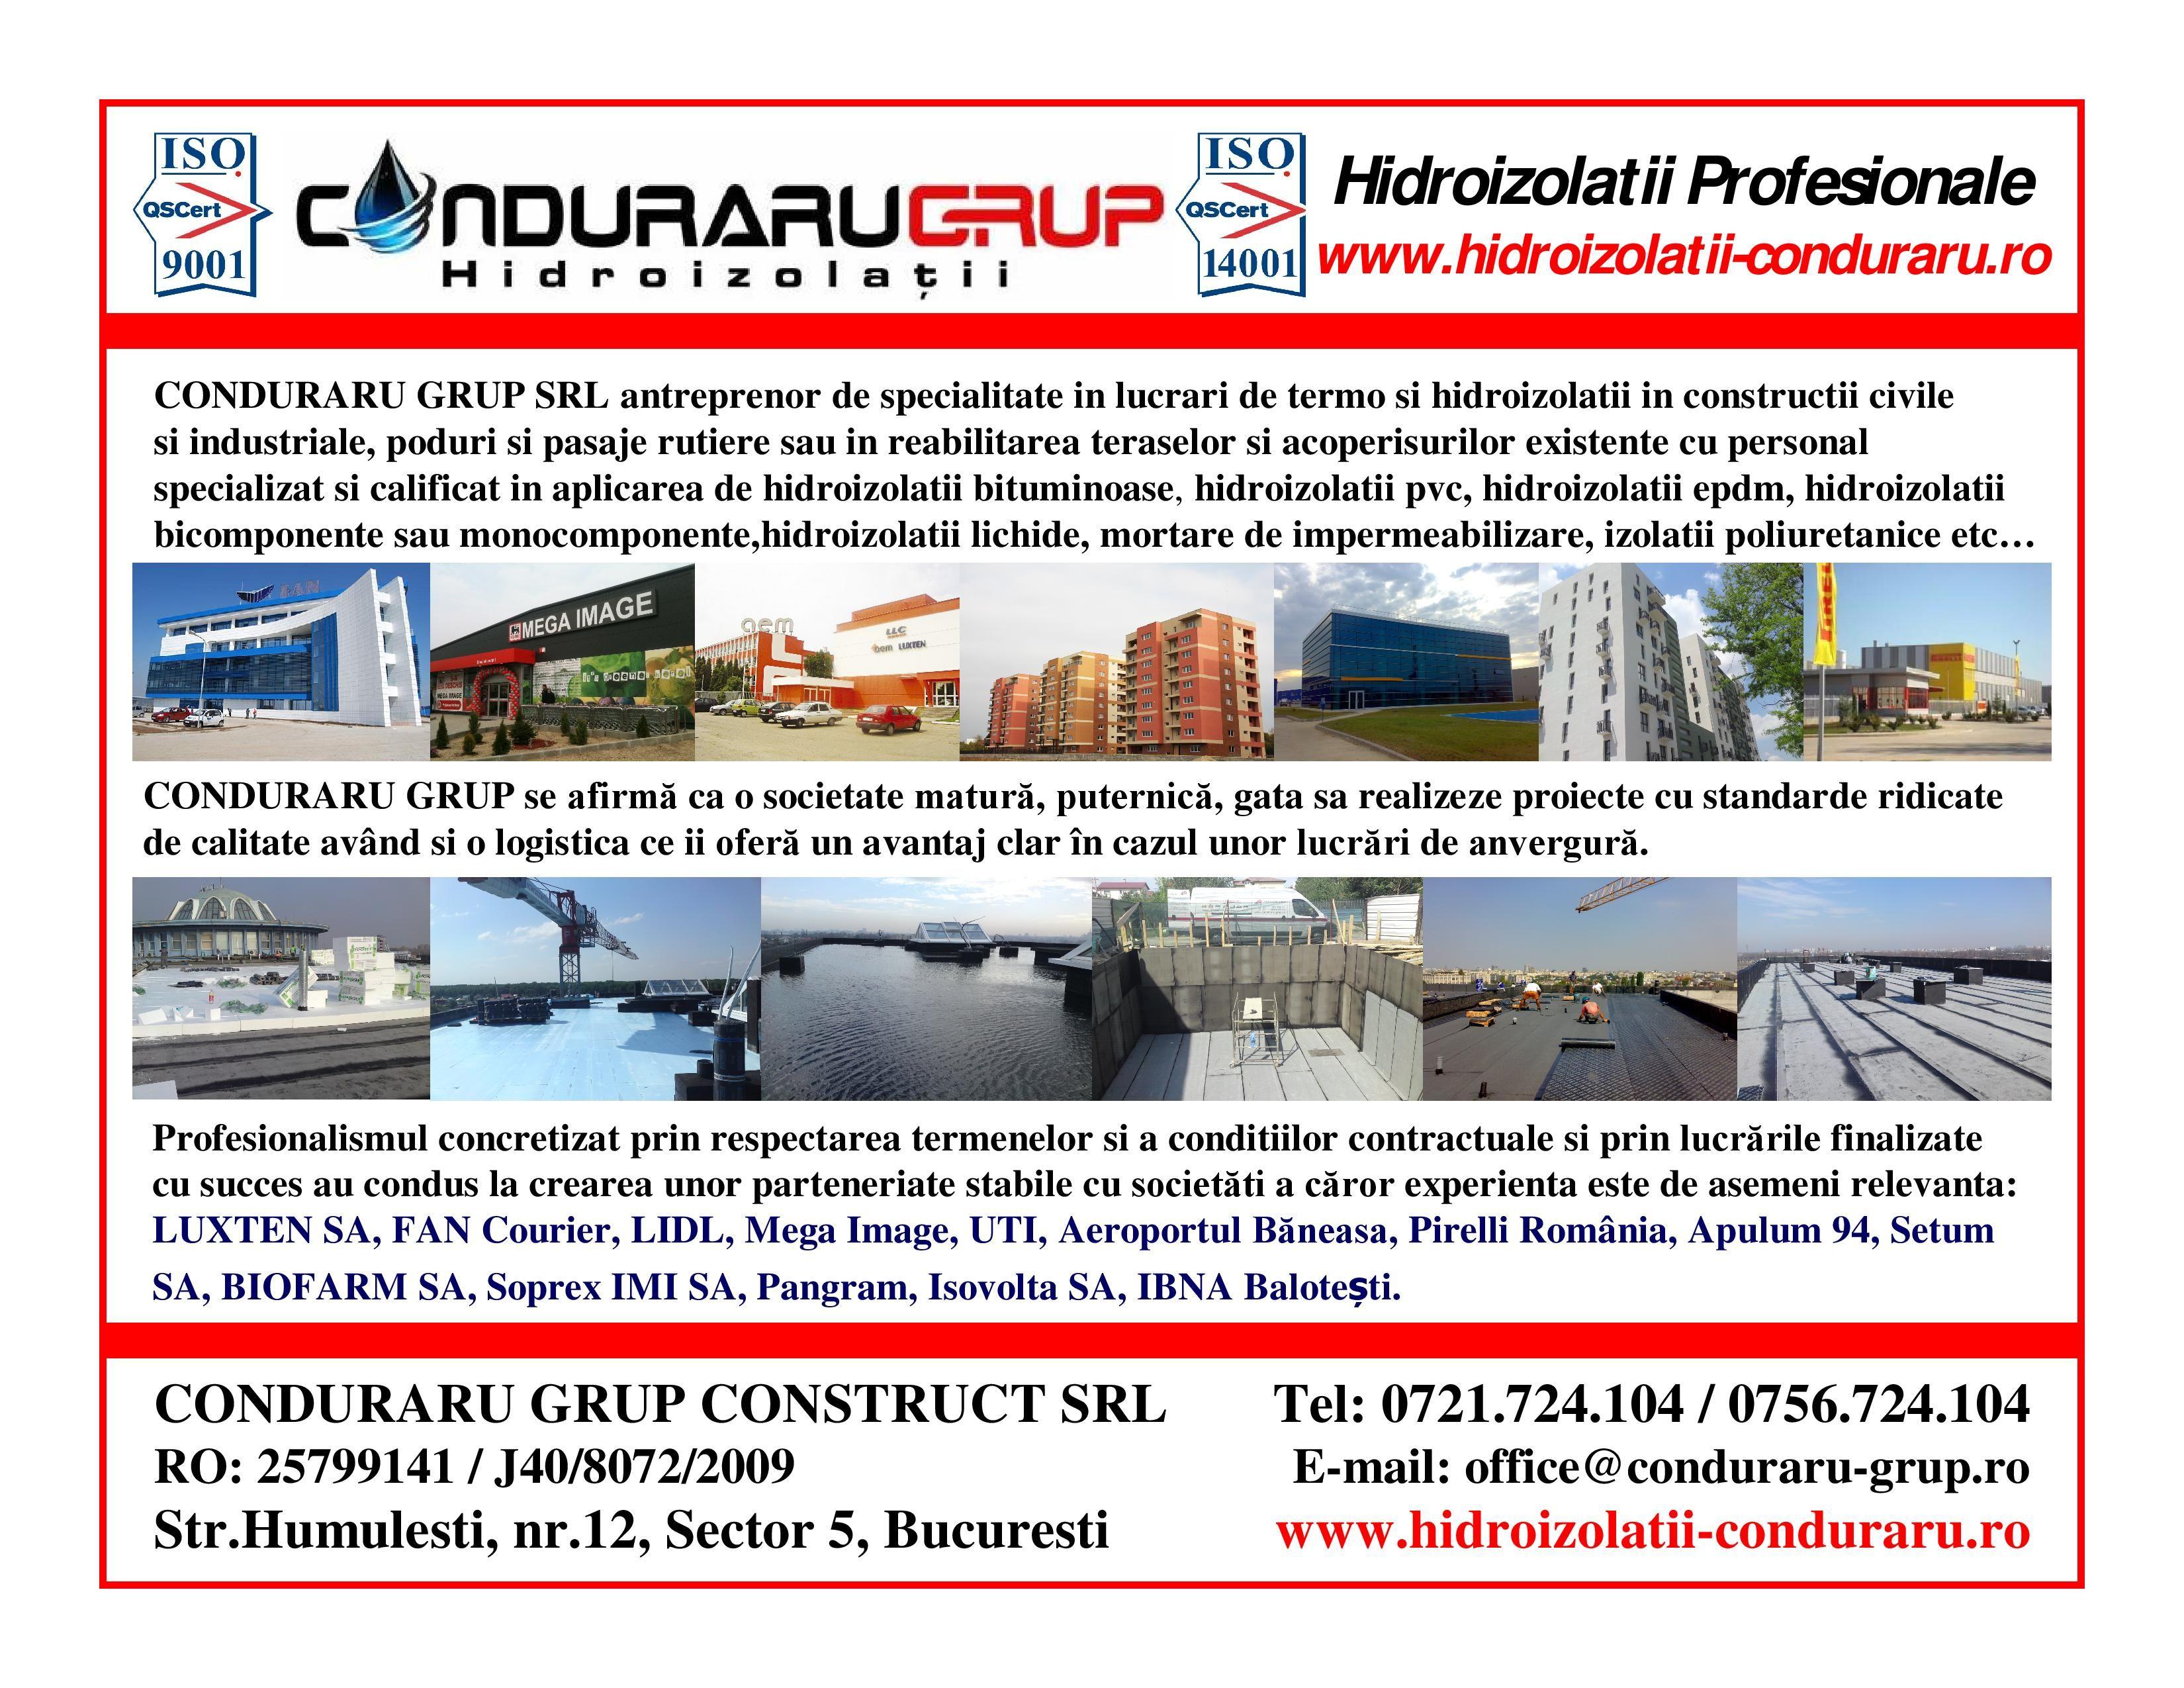 http://www.hidroizolatii-conduraru.ro